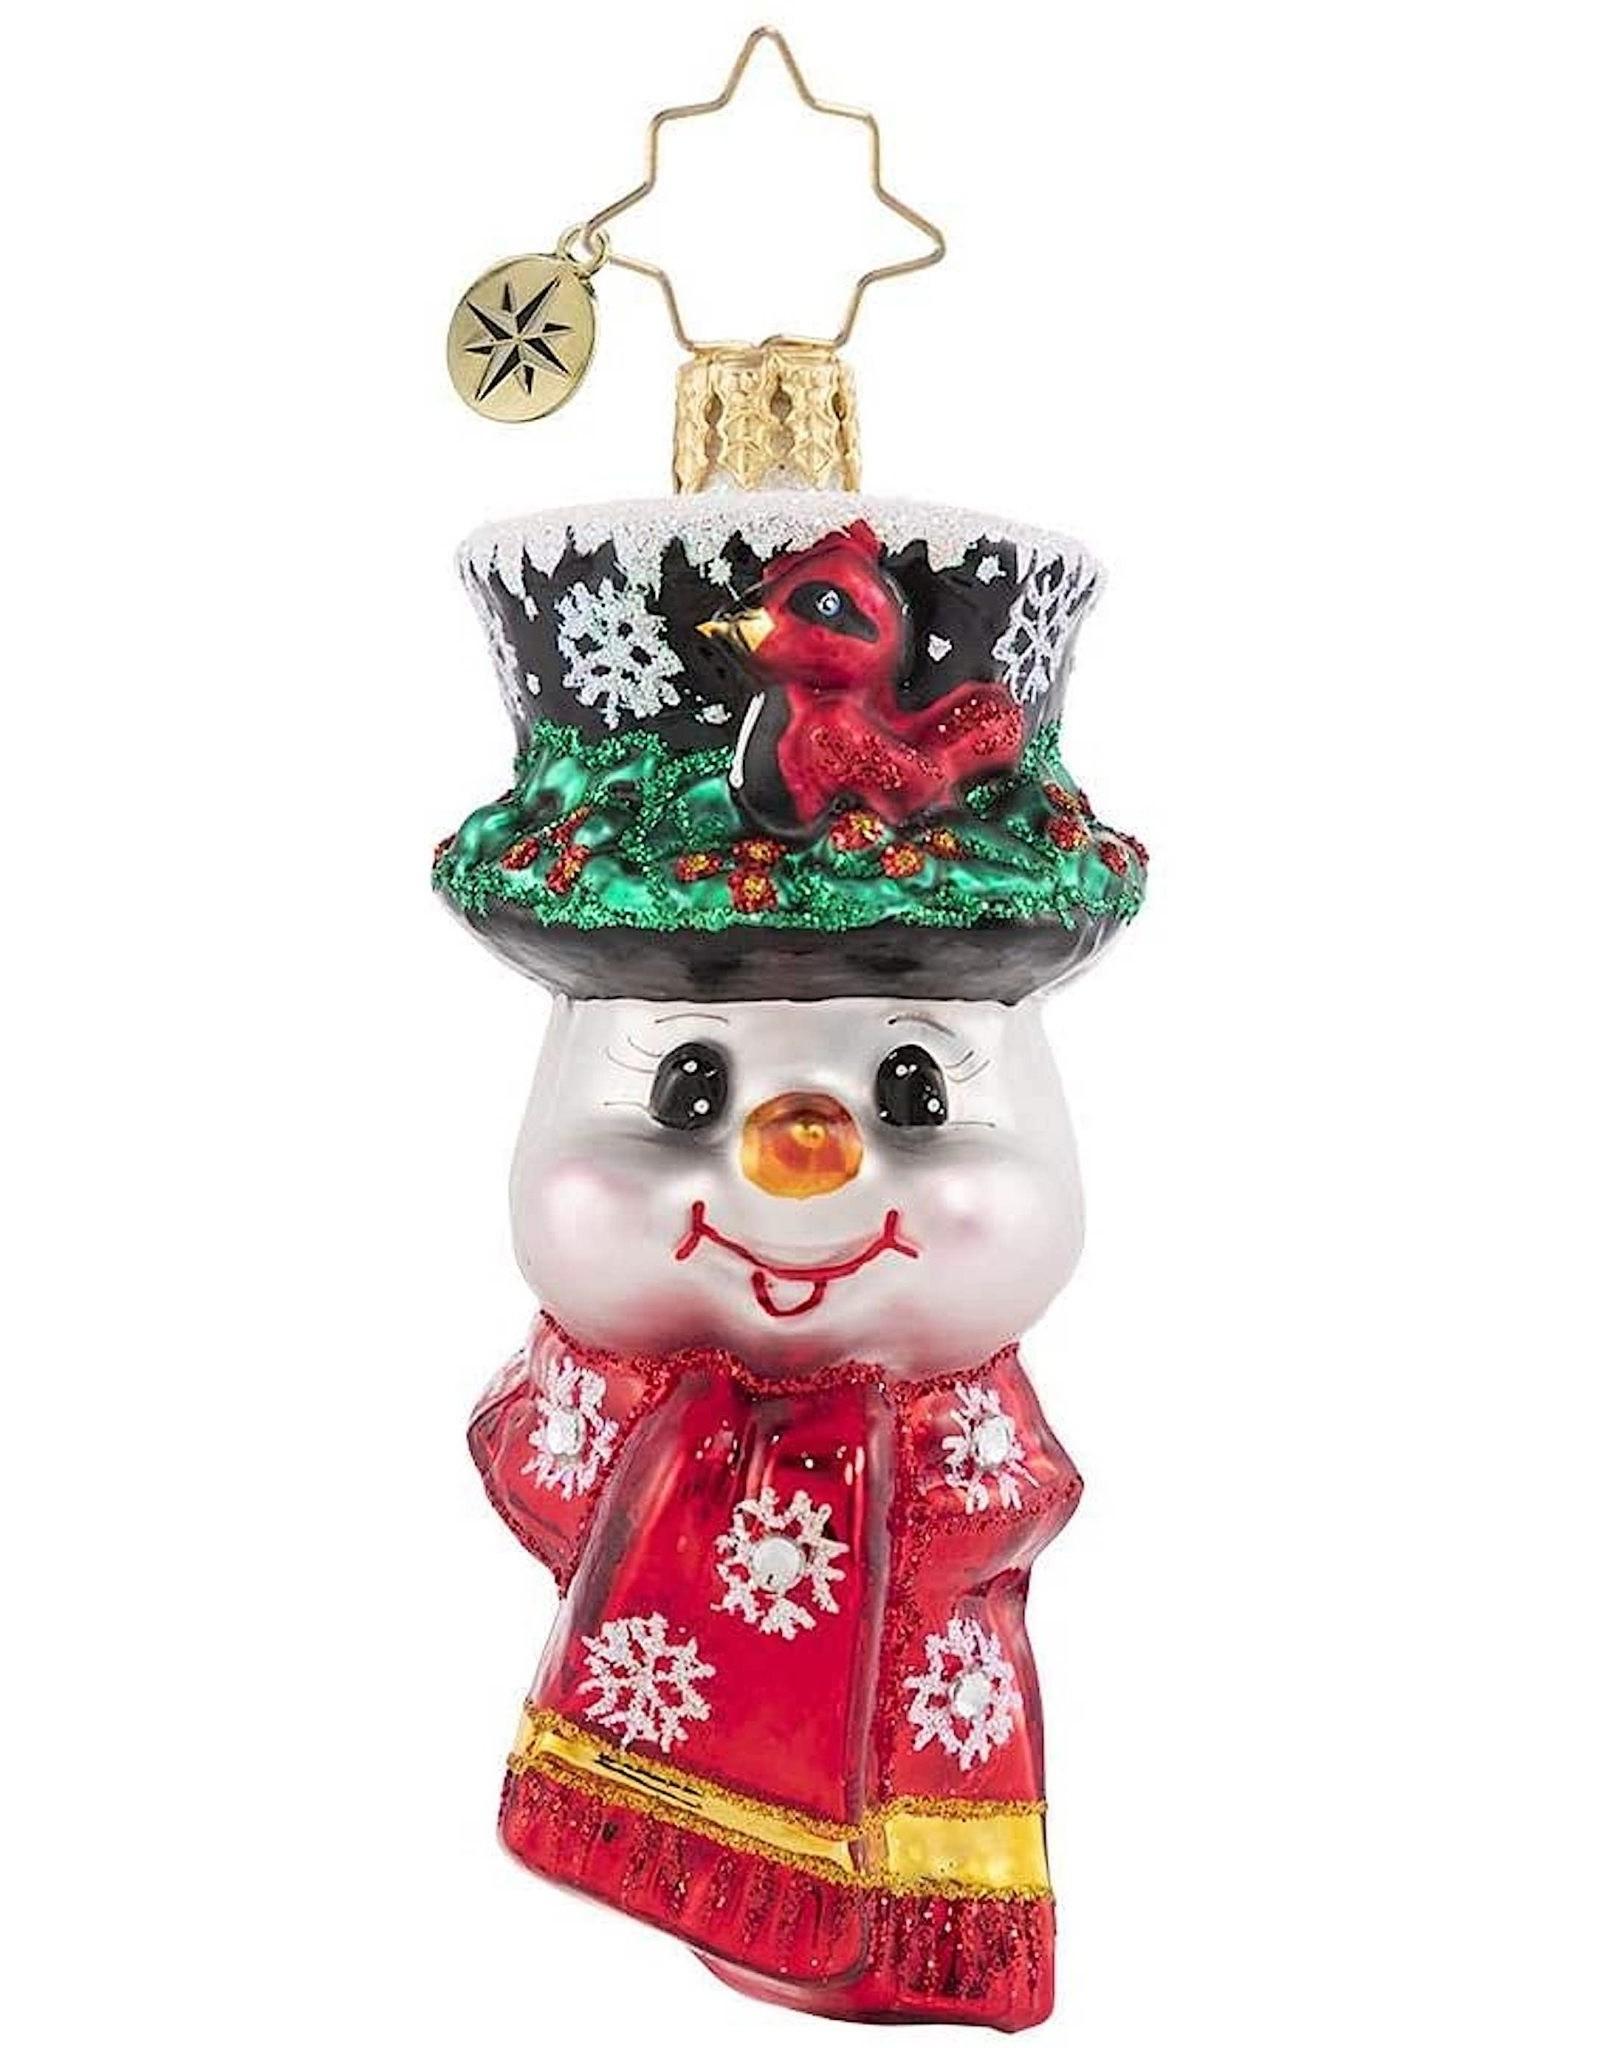 Christopher Radko A Snowman Worth Flocking To Gem Ornament